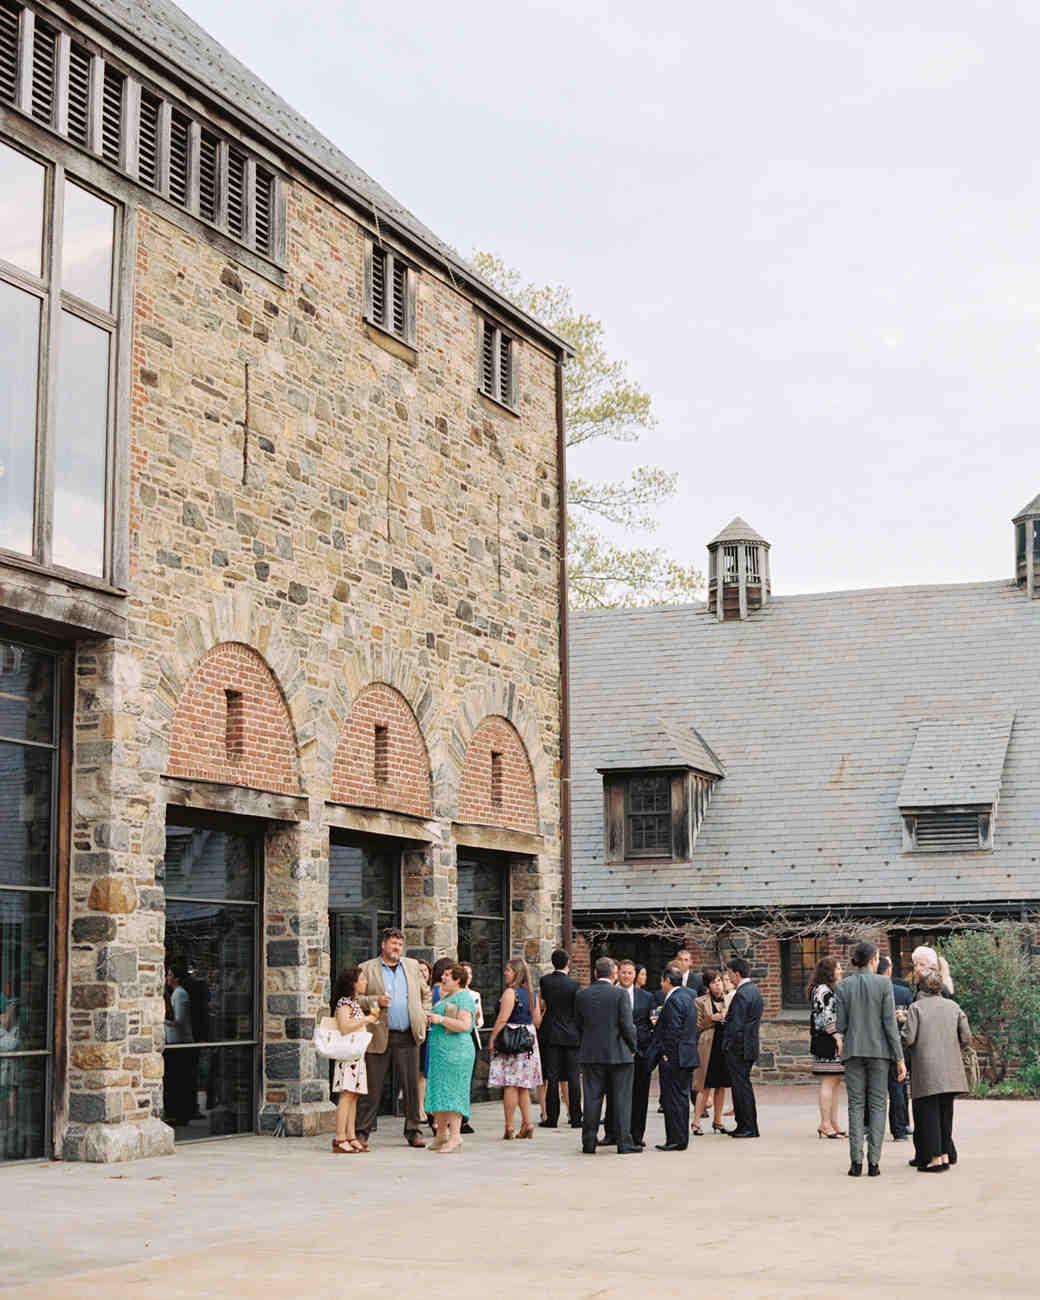 sydney-christina-wedding-cocktailhour-066-s111743-0115.jpg